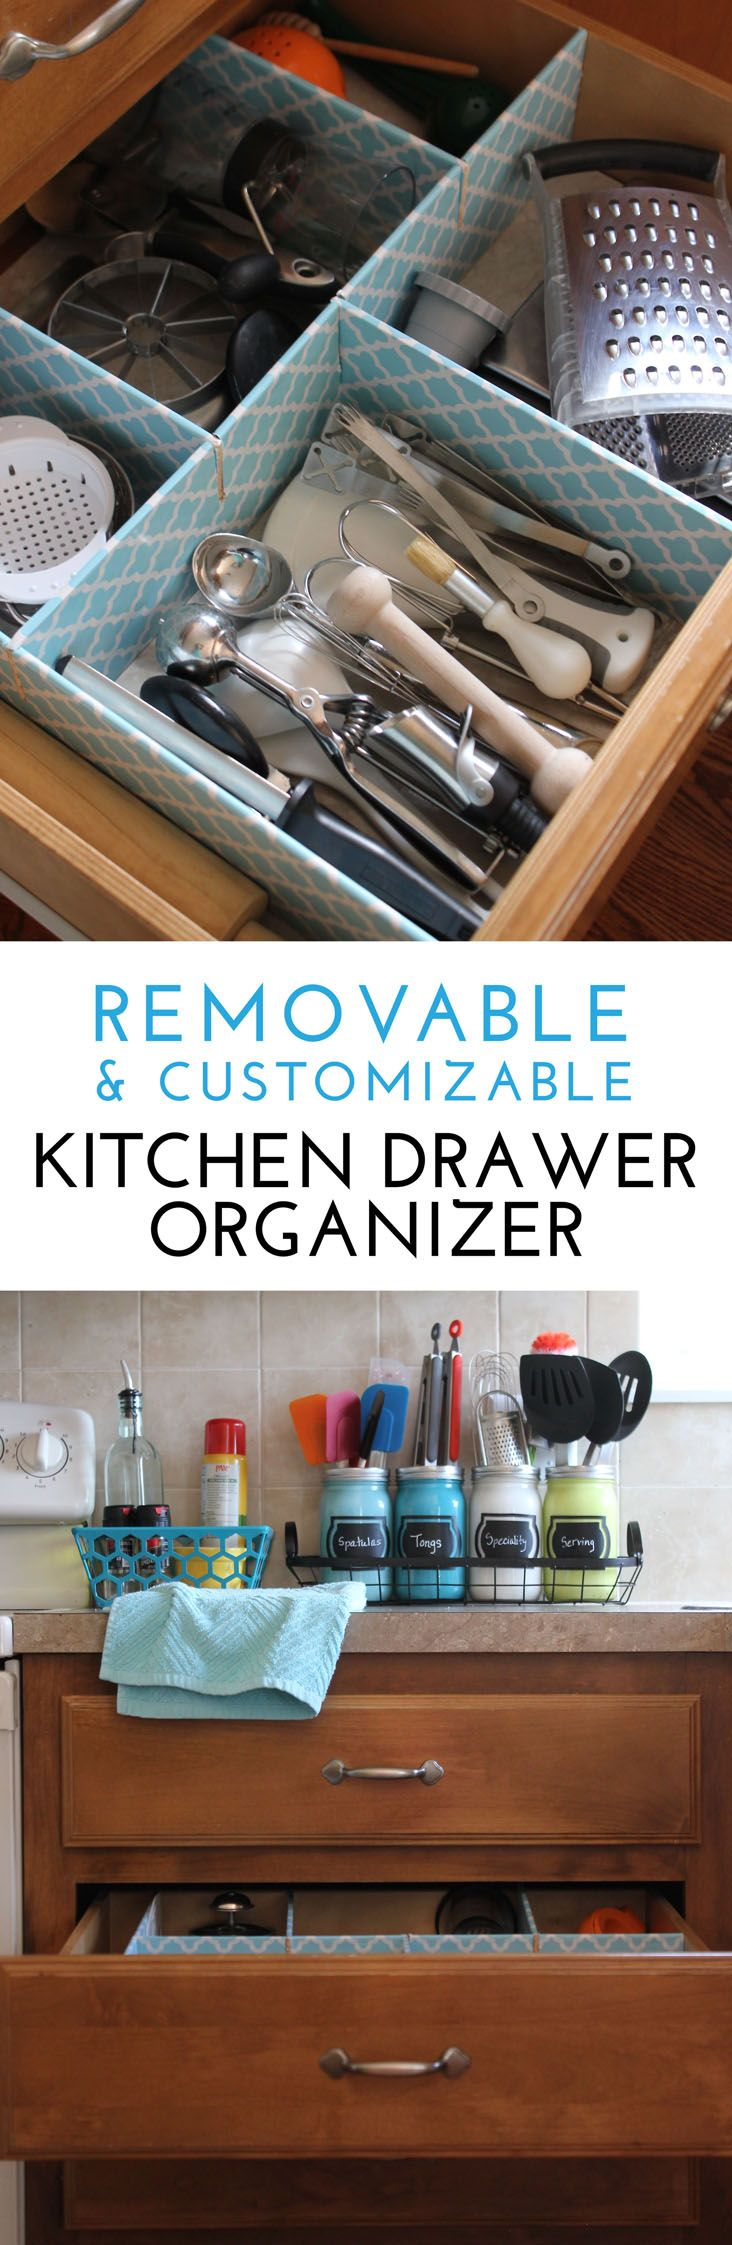 How to Make a Customizable Kitchen Drawer Organizer